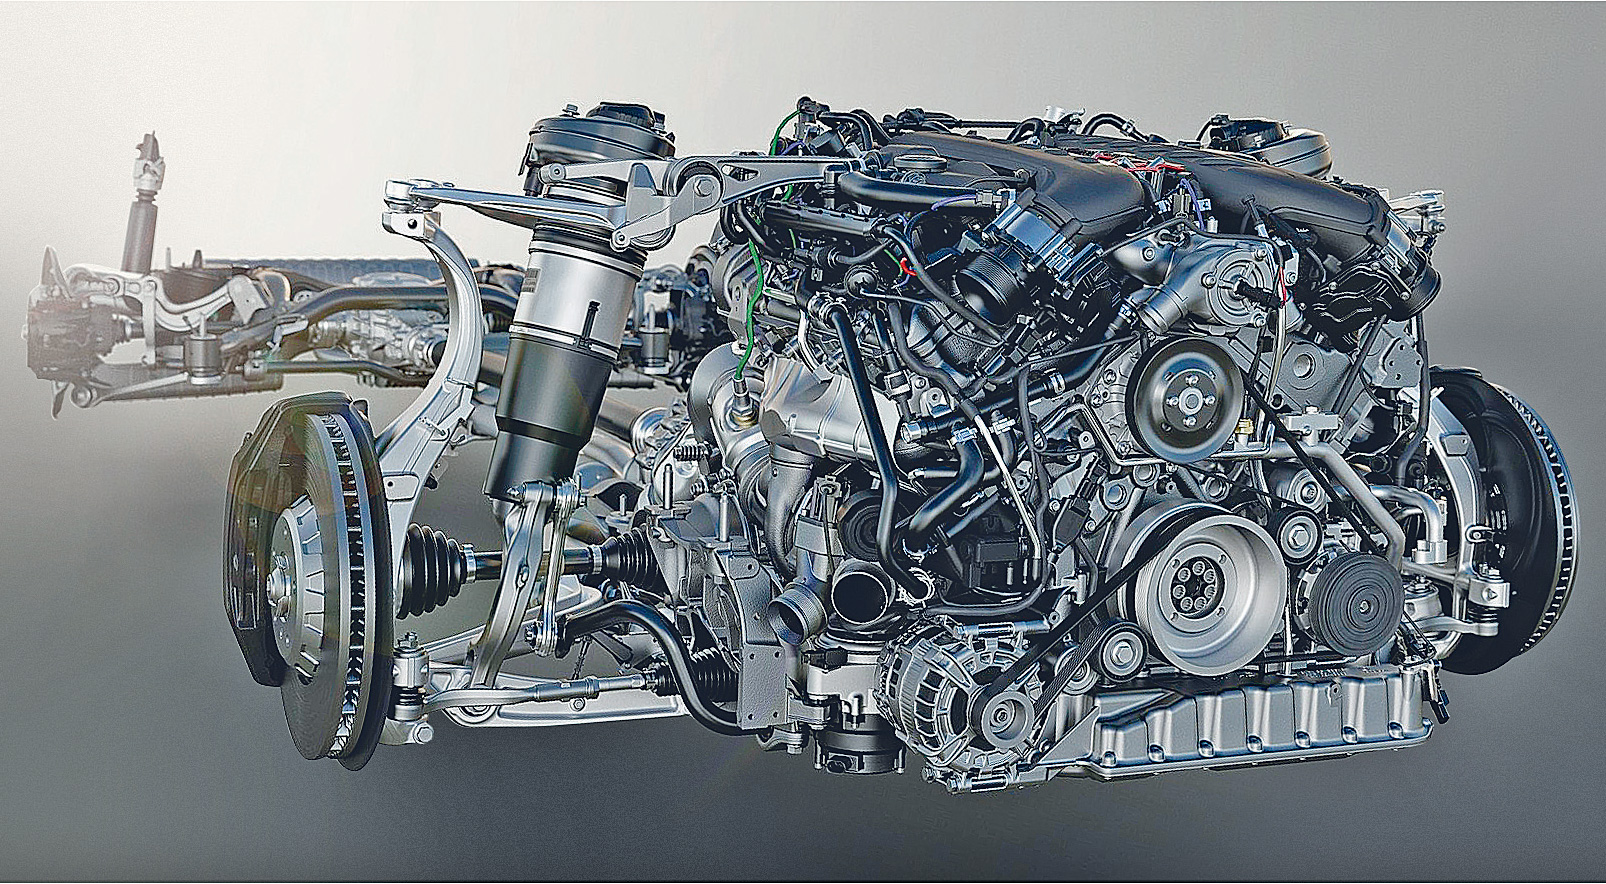 O motor V8 4.0 triturbo do Bentley Bentayga